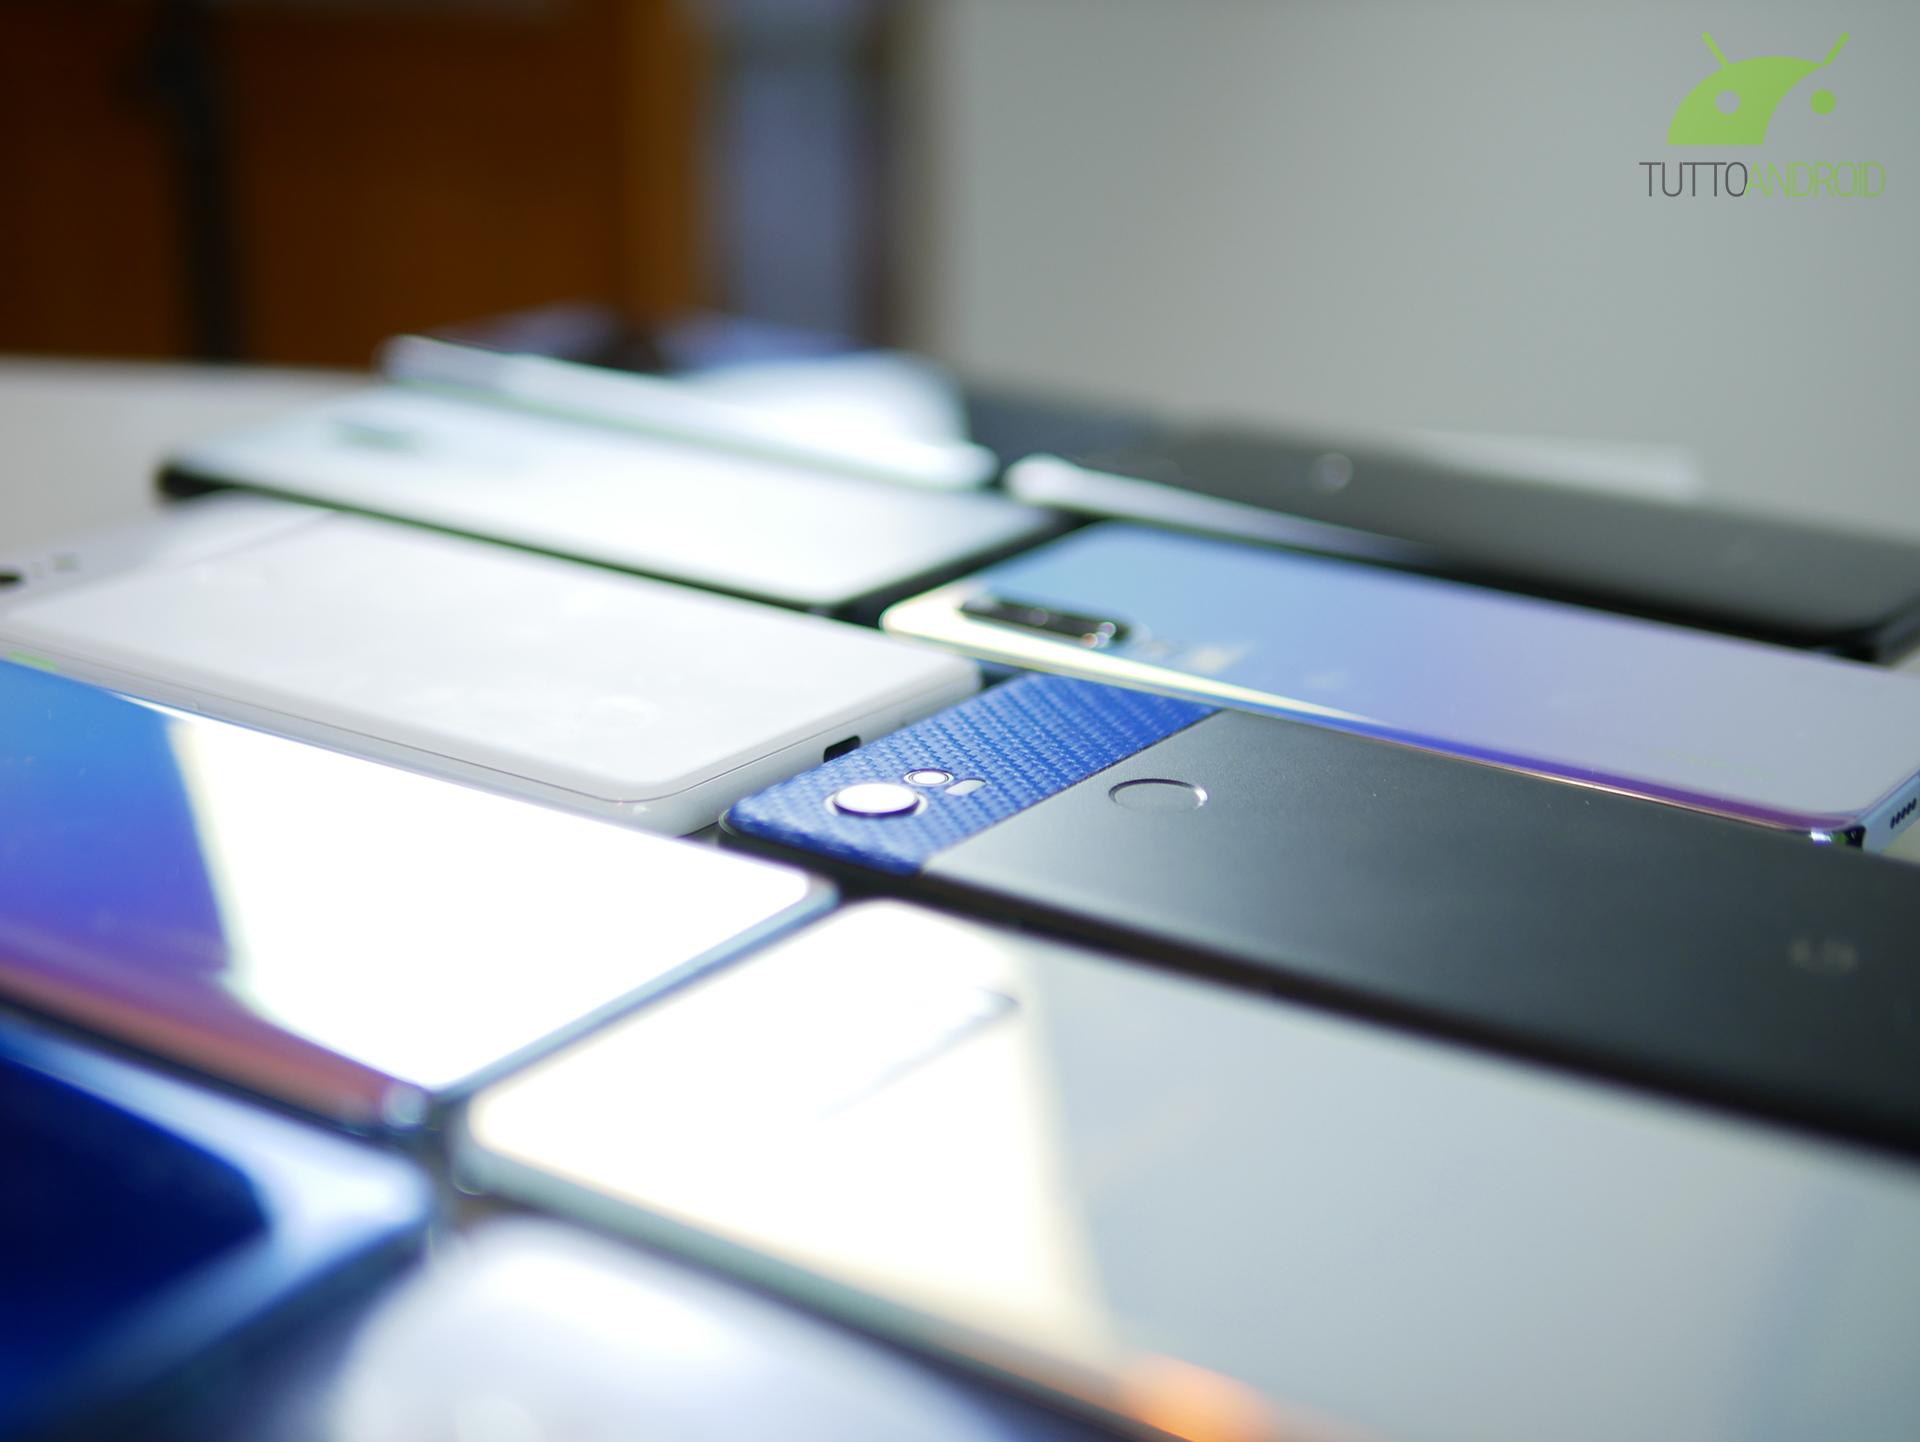 Offertone su store online per Huawei P40 Lite 5G, Motorola Edge e tanti altri